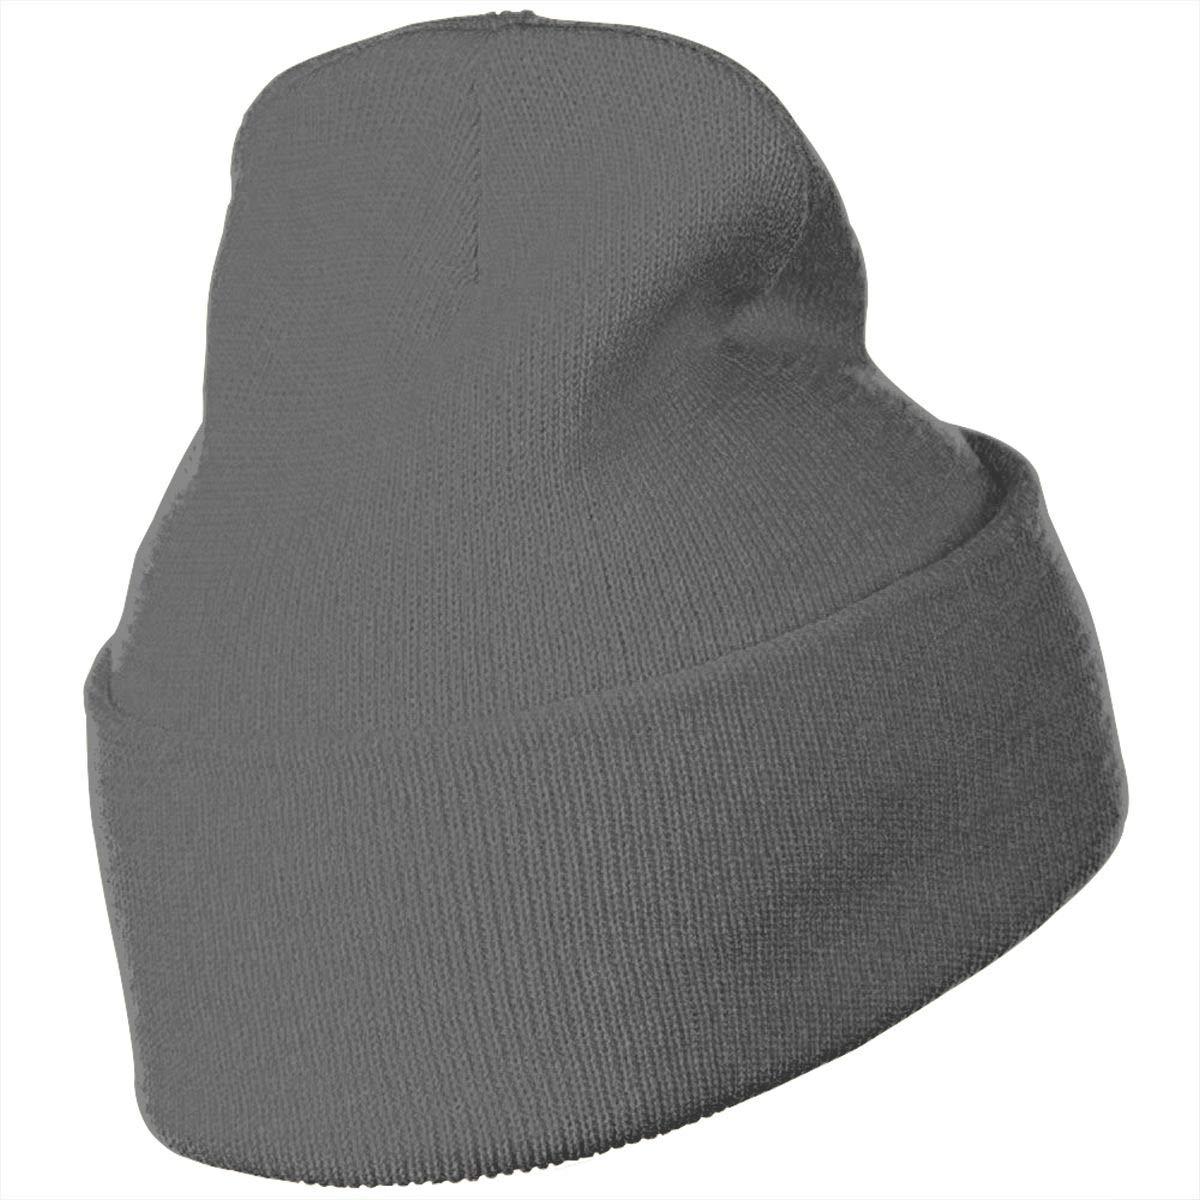 JimHappy DD214 Alumni Winter Warm Hats,Knit Slouchy Thick Skull Cap Black